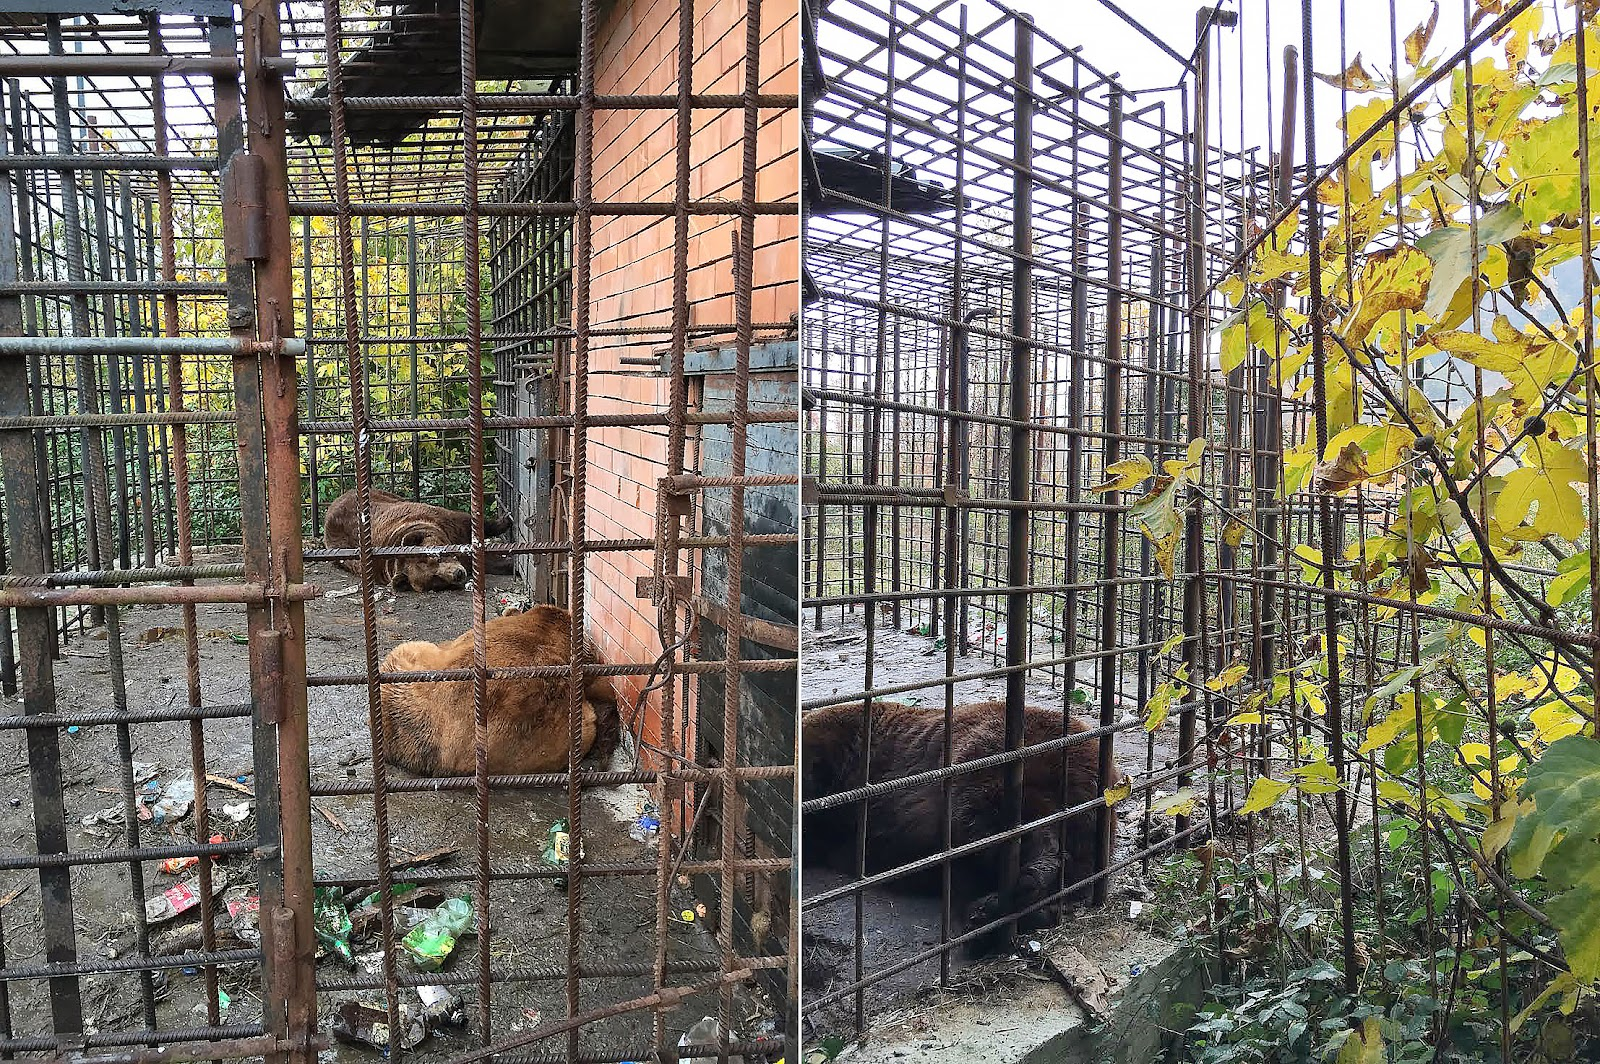 Два медведя-алкоголика изъяты у хозяина ресторана в Сочи